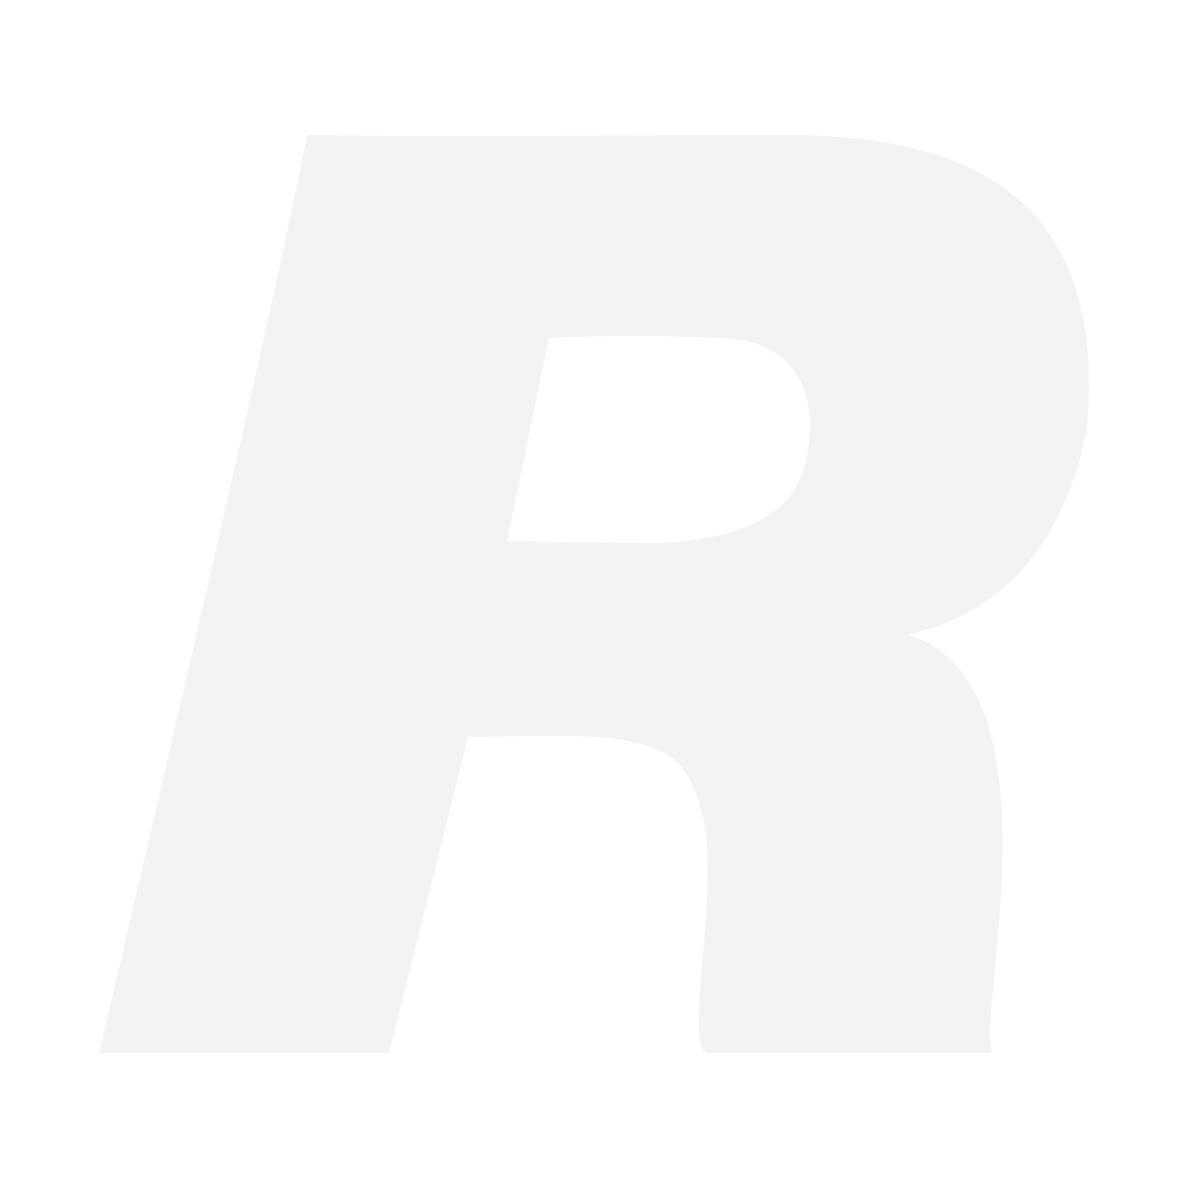 Lastolite LR7231 Reflector Silver/White 1.2 x 1.8m